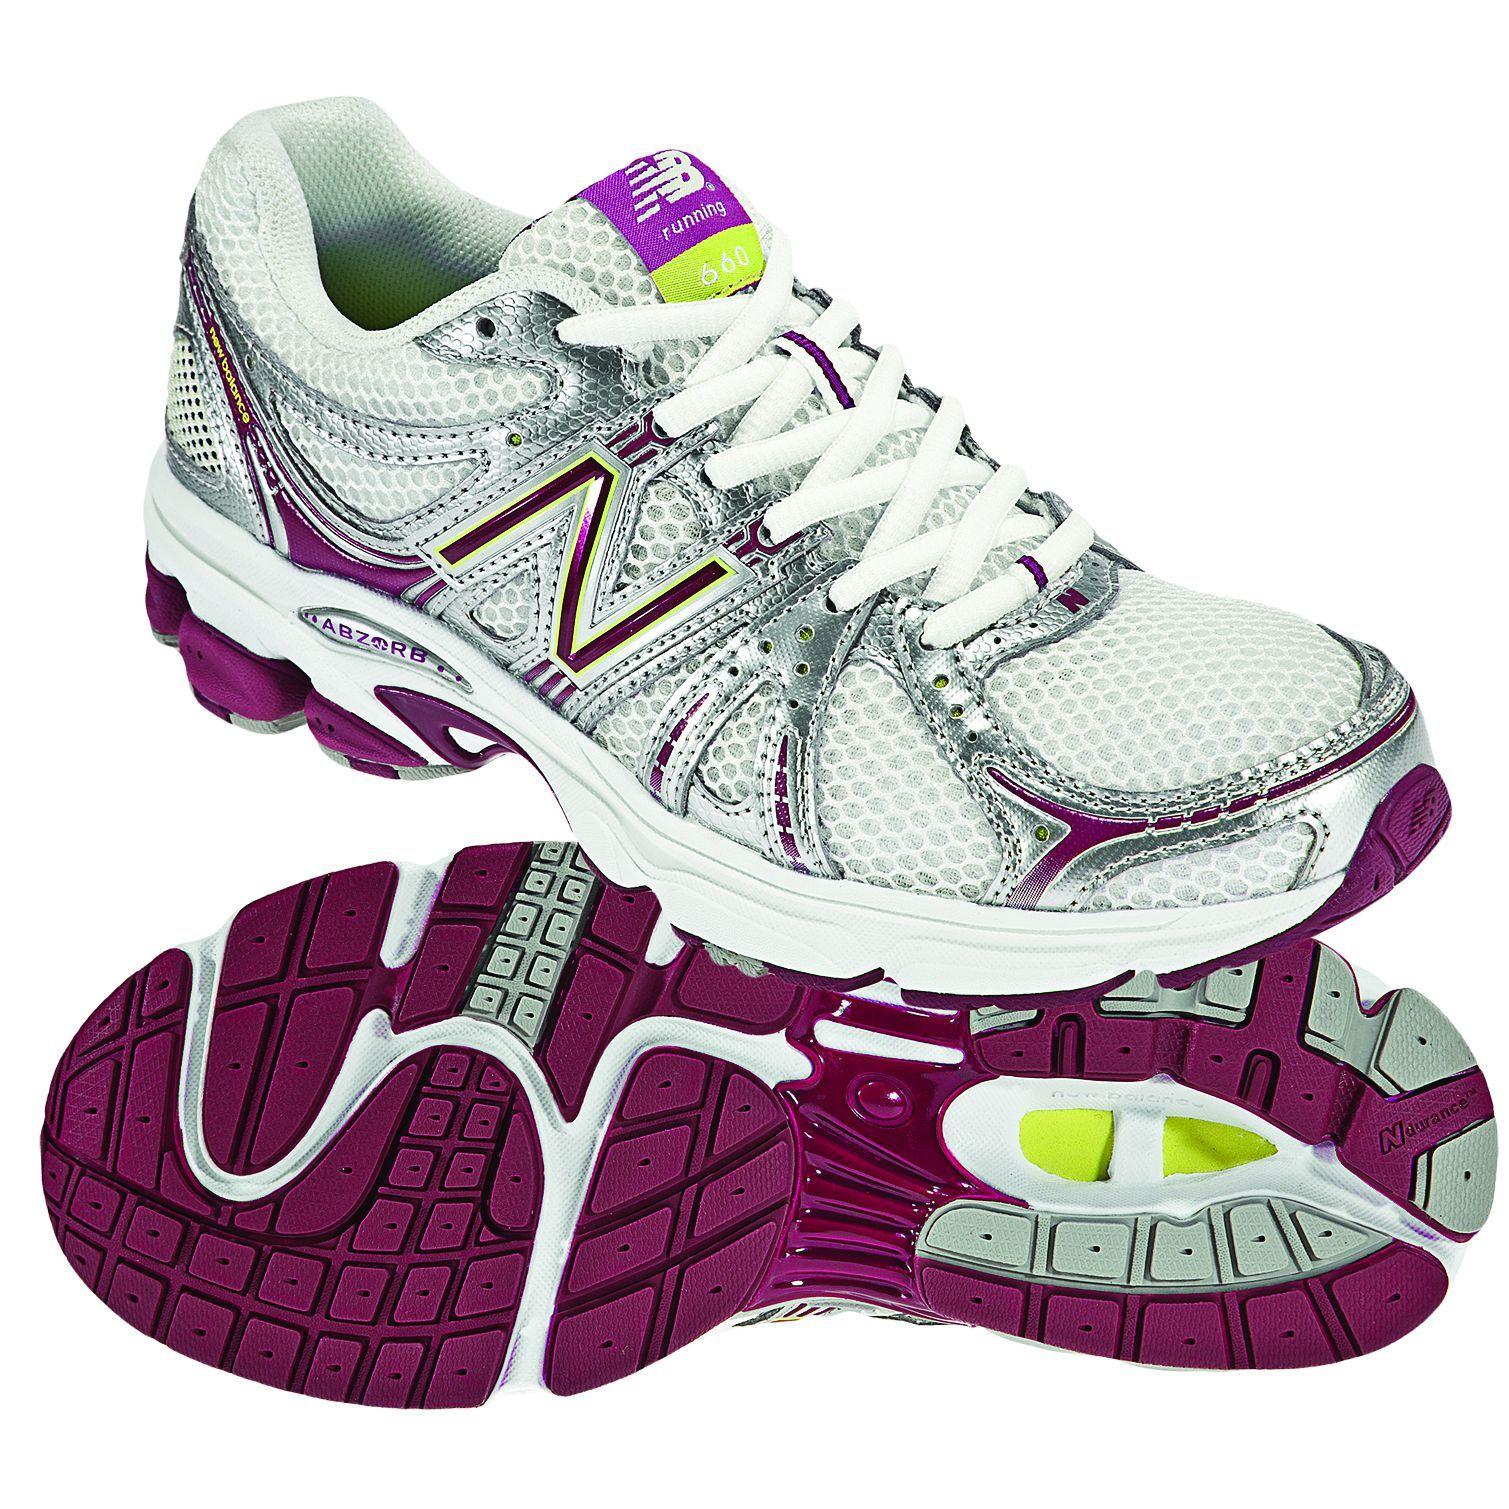 New Balance 660 Womens Running Shoes